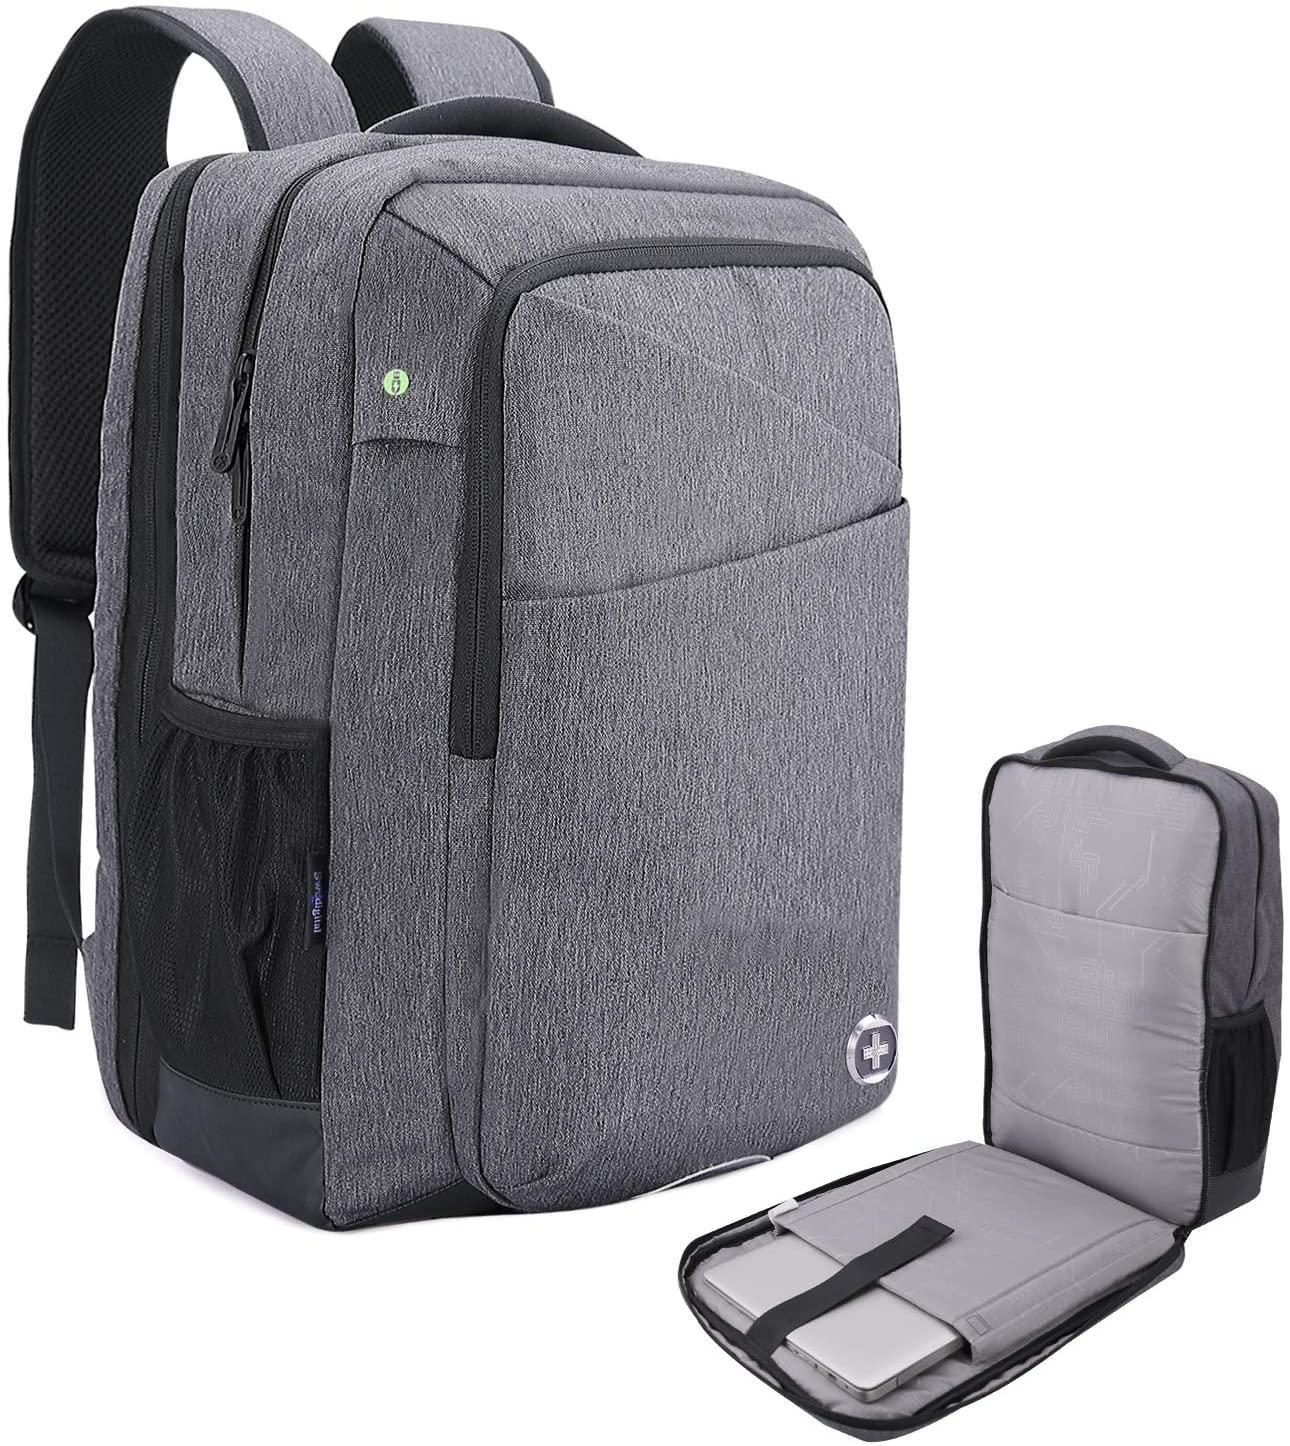 Swissdigital TSA-Friendly Backpack